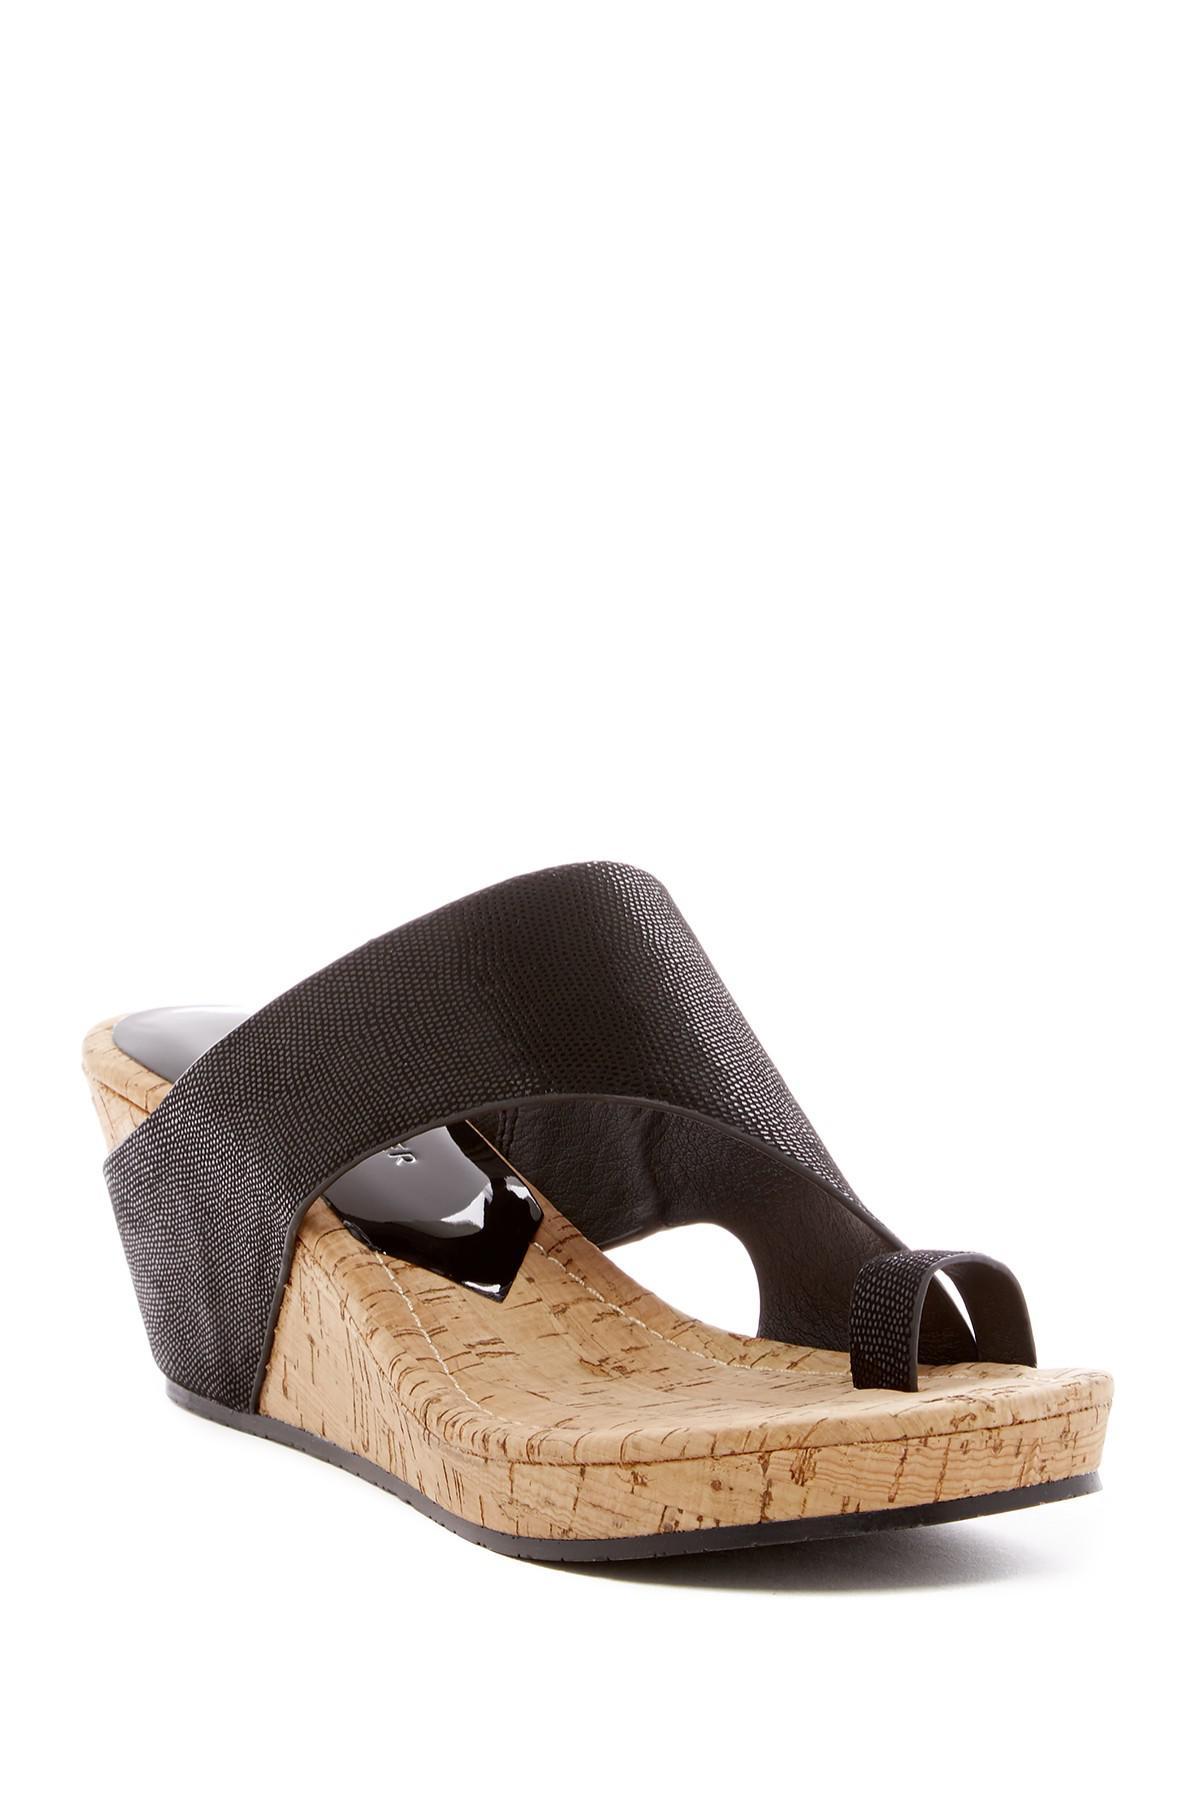 6cfef1a0bc4 Lyst - Donald J Pliner Gyer Wedge Sandal in Brown